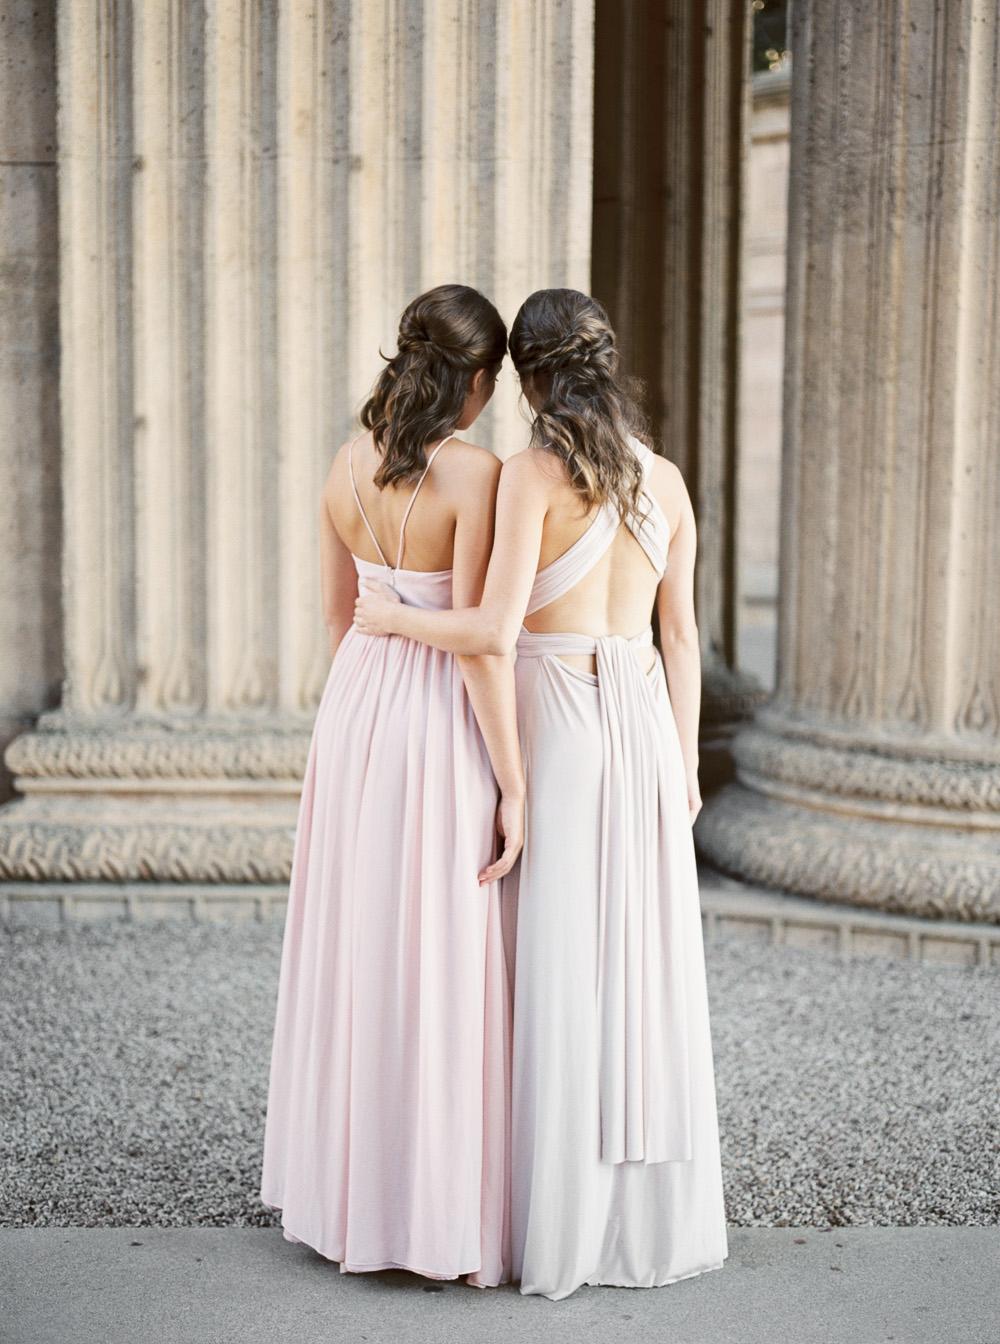 Weddington Way blush pink bridesmaid dress | by Lara Lam photography